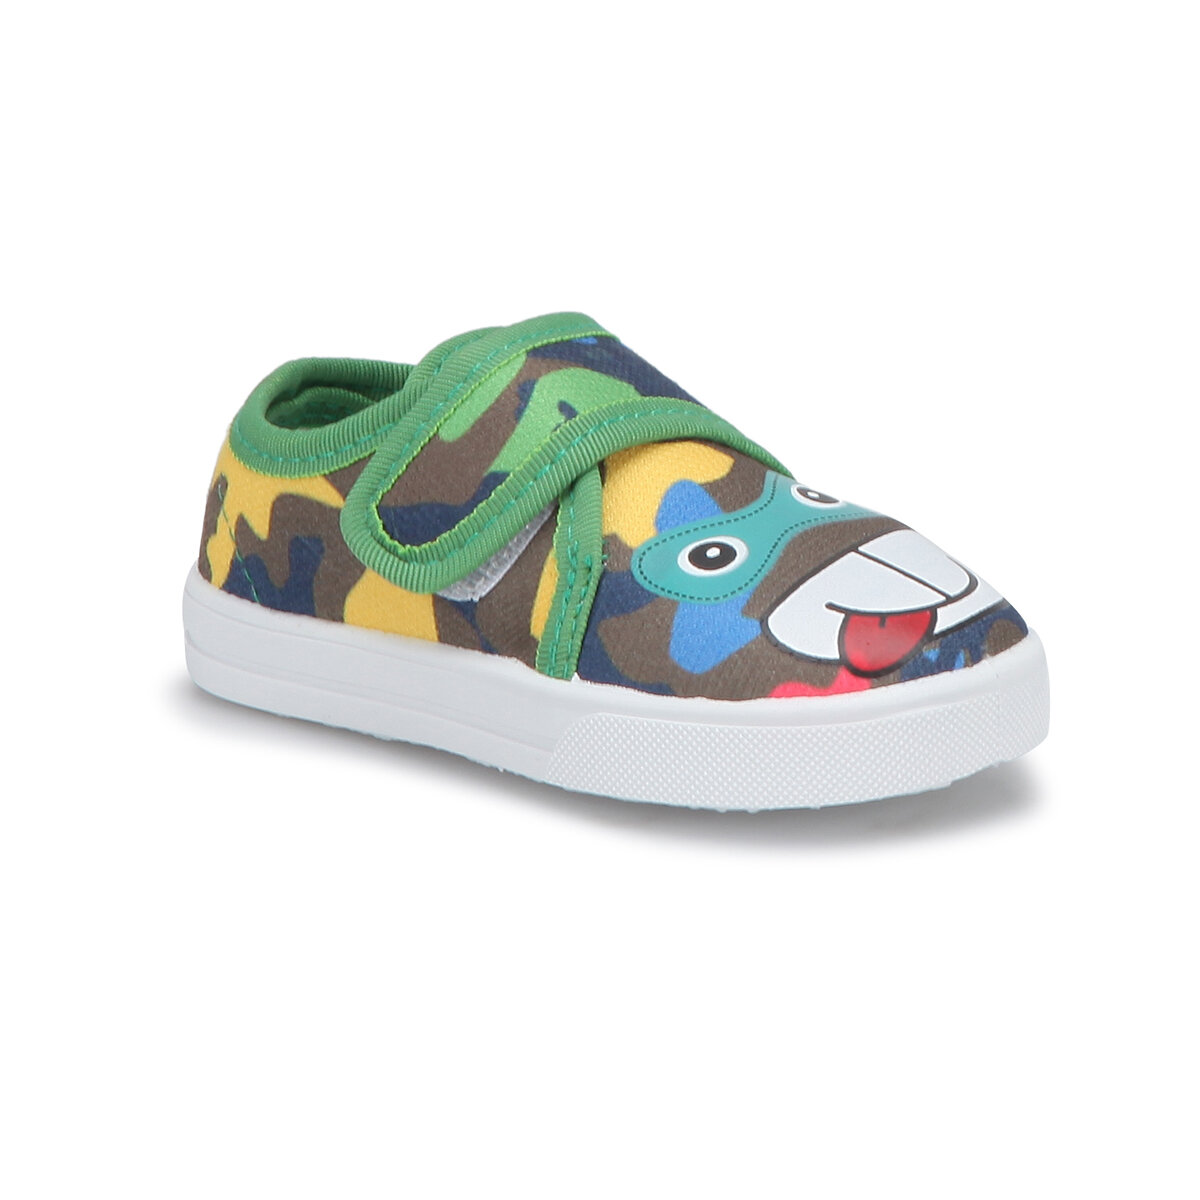 FLO 71. 509200.B Green Male Child Slip On Shoes Polaris